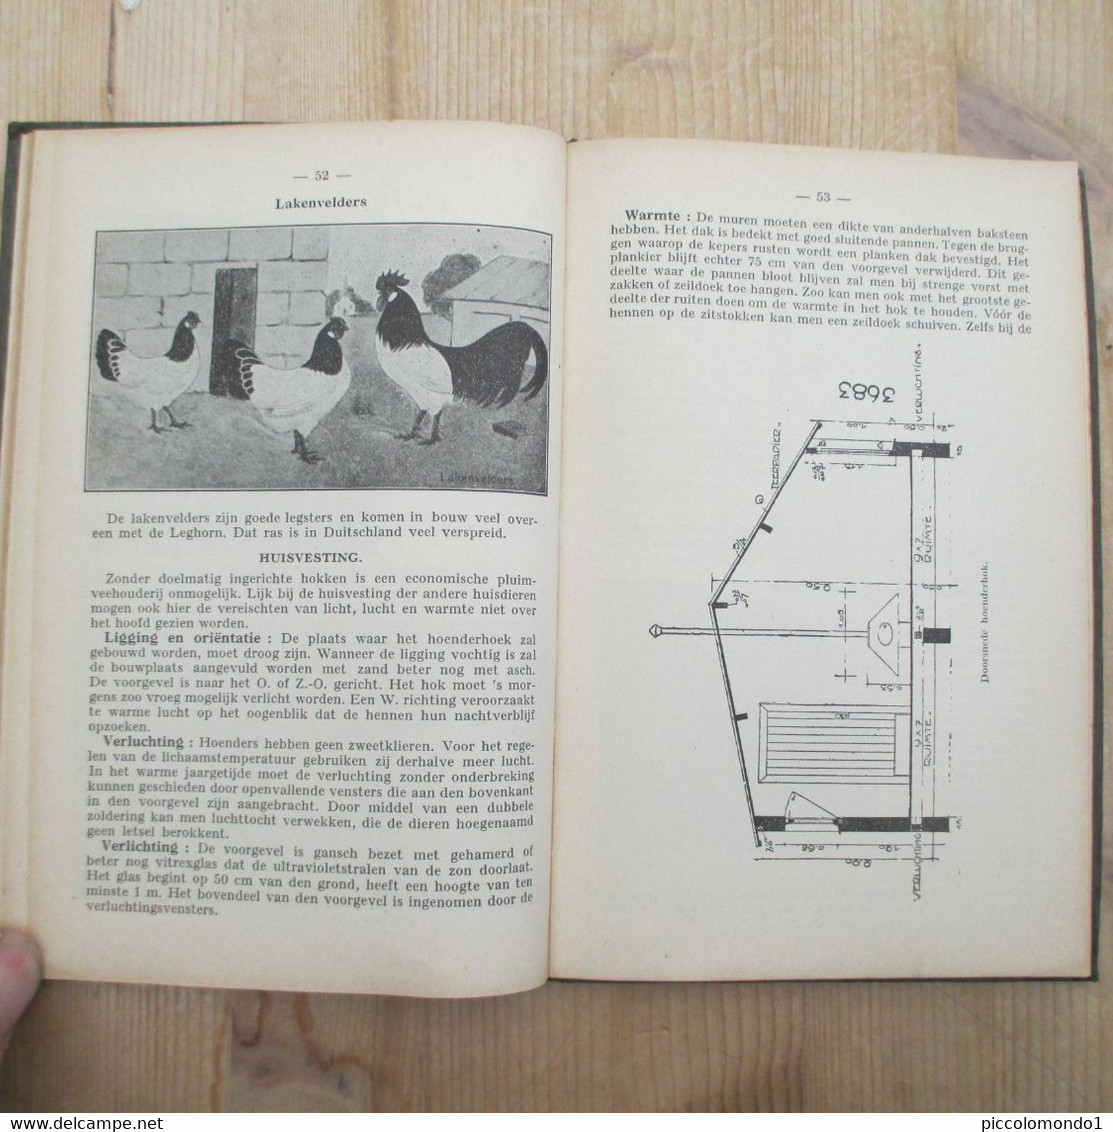 Terug Naar Het Land Leerboek Dierenteelt Paard Hoenders Leghorn Varken Geit 1942 Kleinvee Landbouwschool - Practical